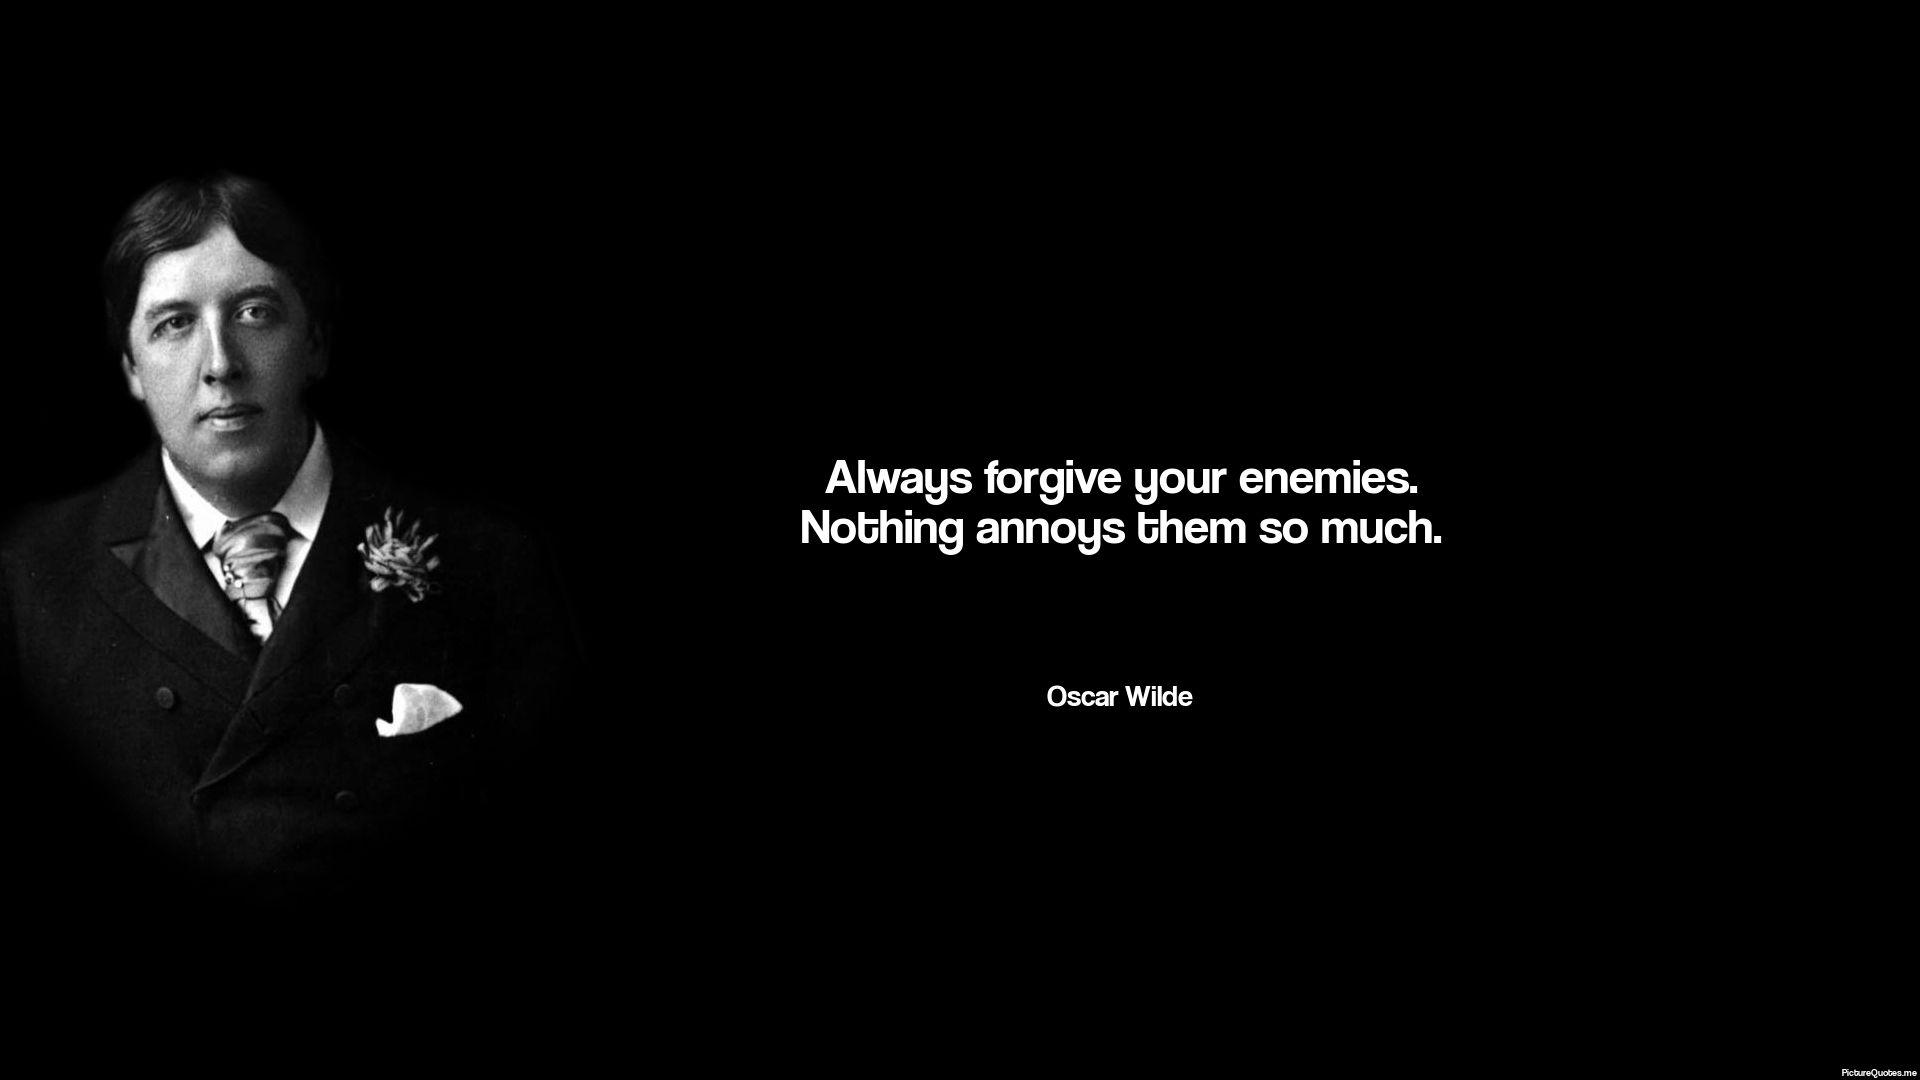 Always forgive your enemies. Nothing annoys them so much. - Oscar Wilde   id: 5660